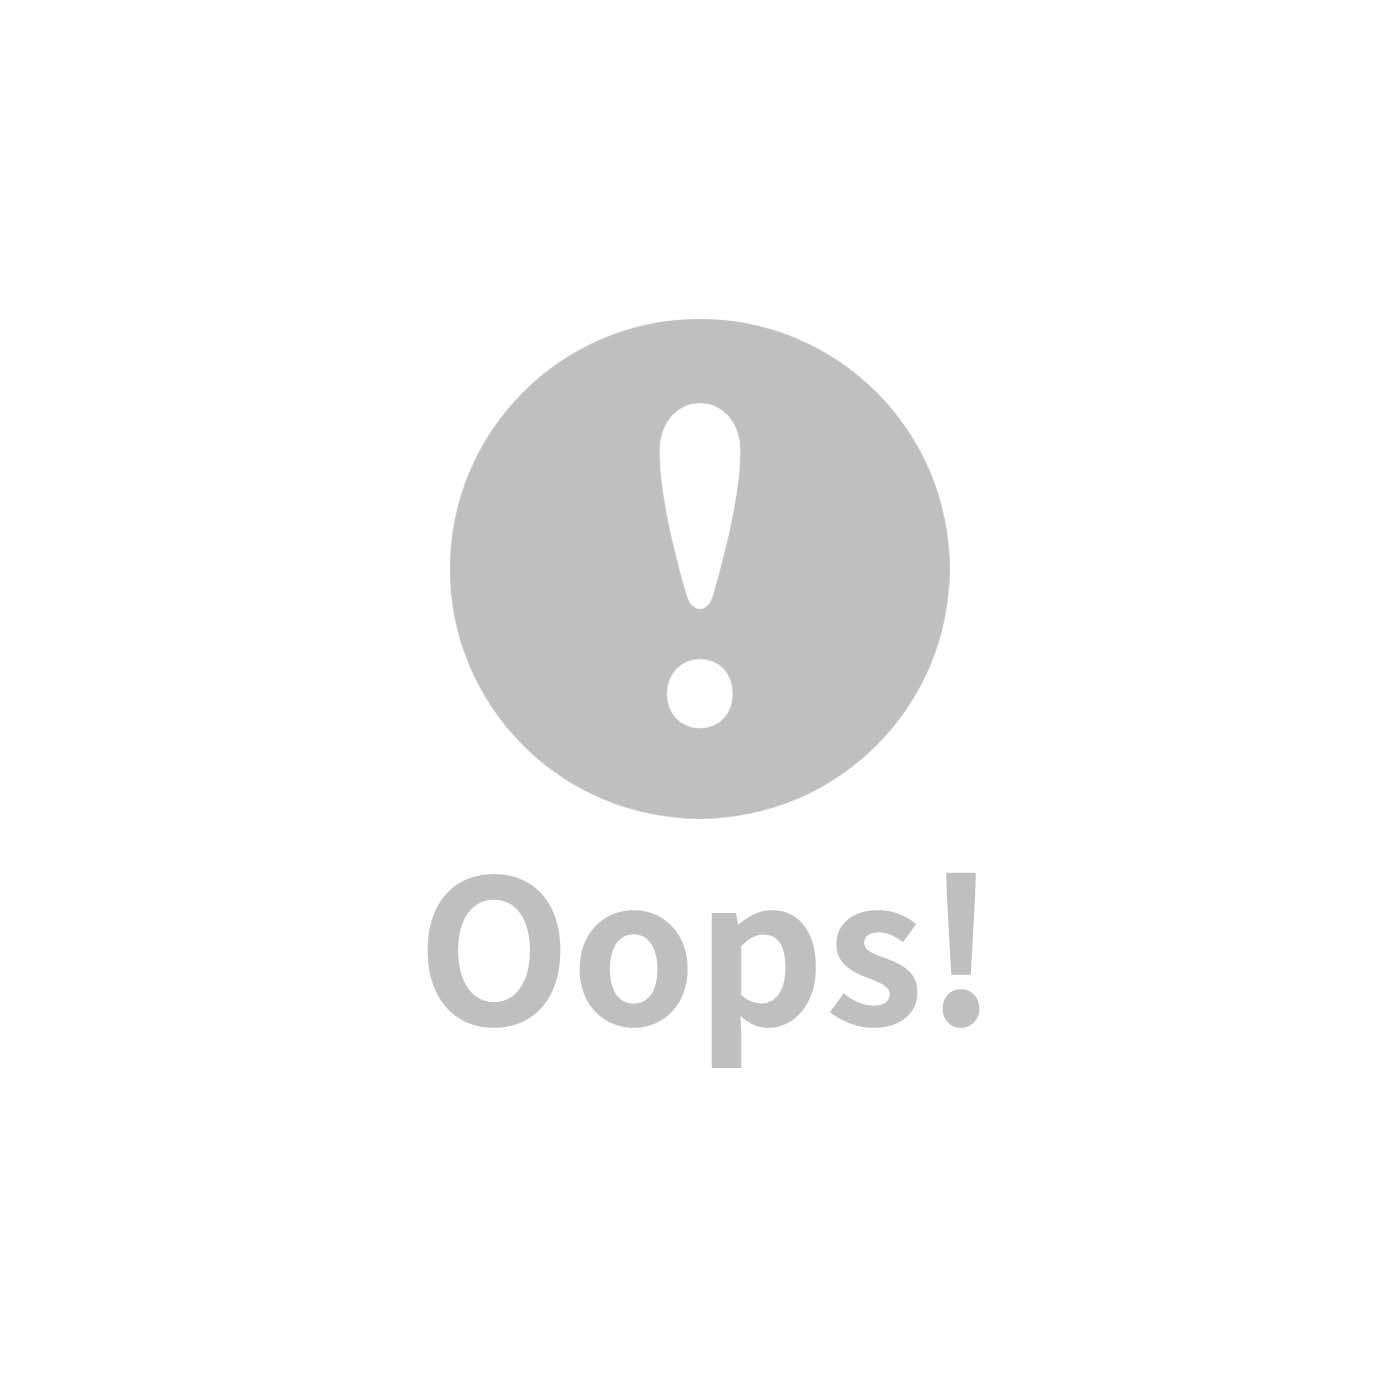 global affairs 童話手工編織安撫玩偶(36cm)-柔伊熊